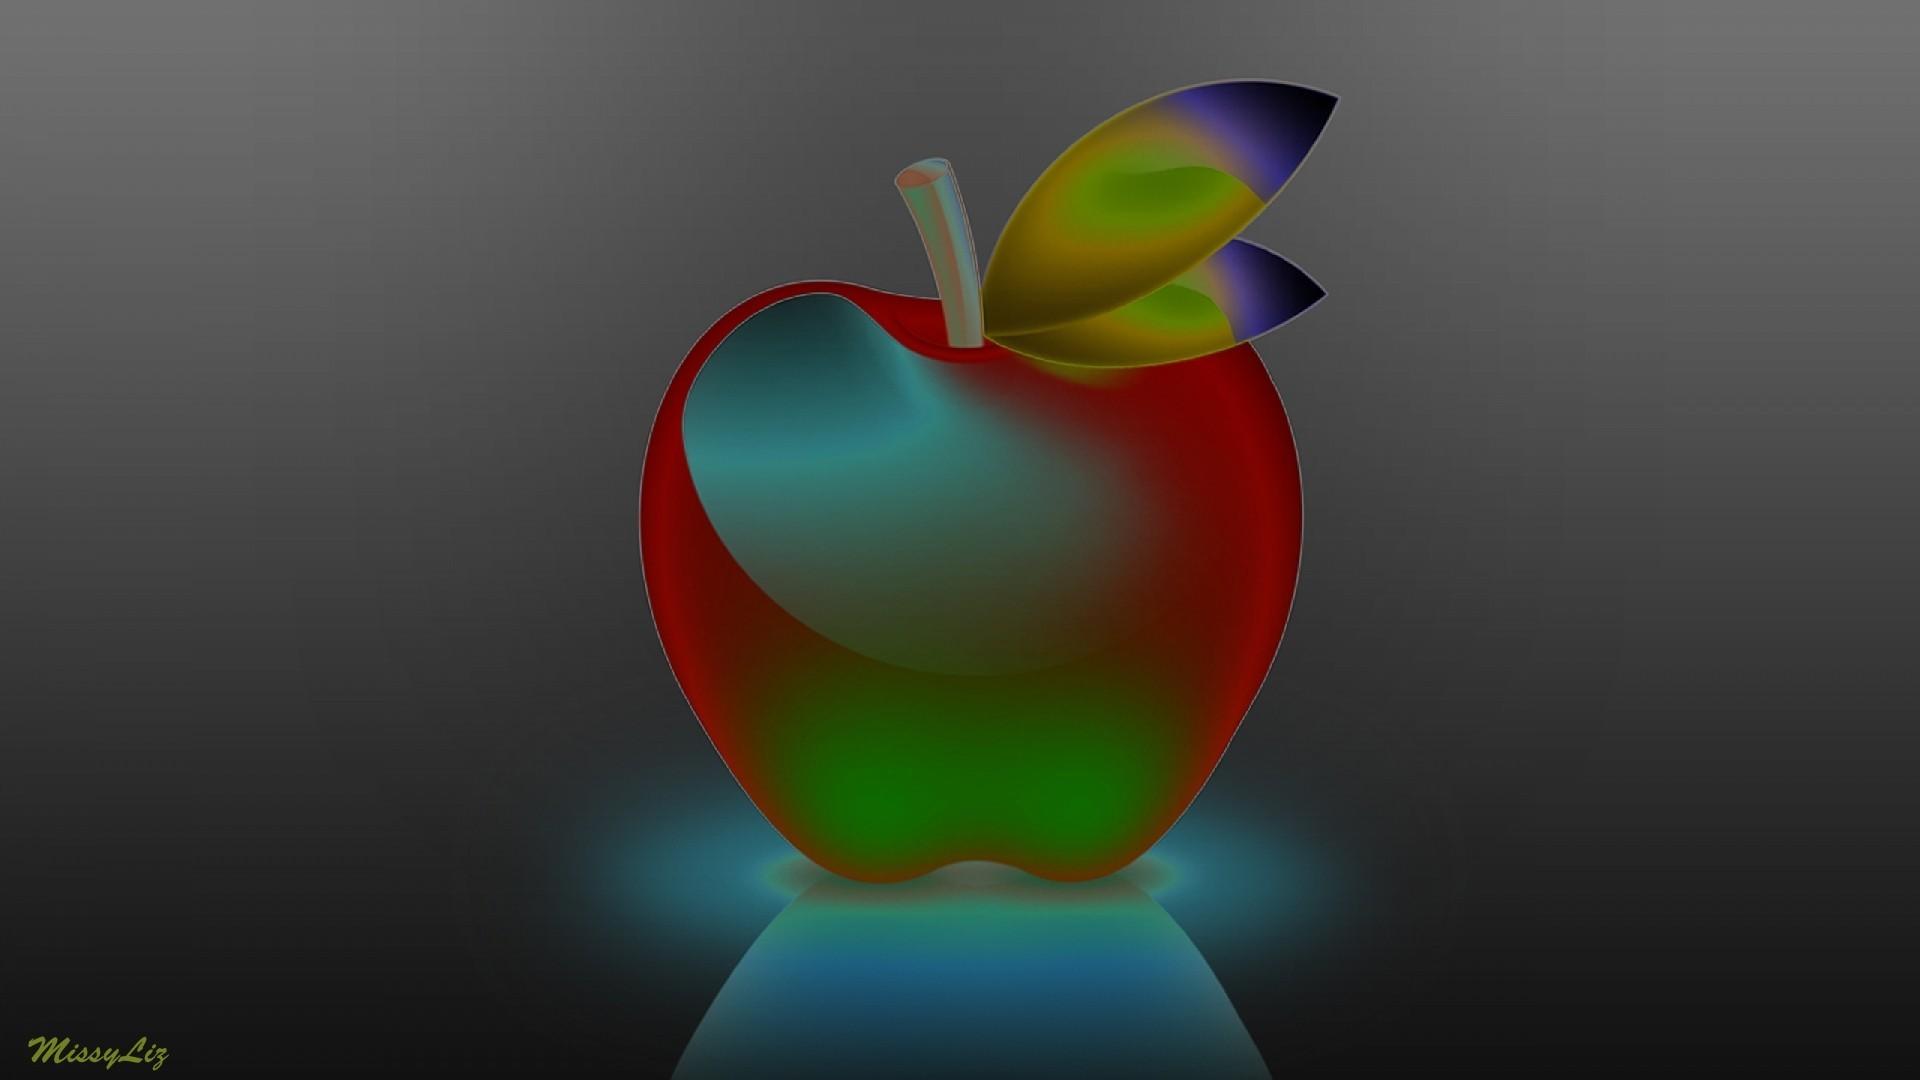 Картинки на рабочий стол айфон яблочко